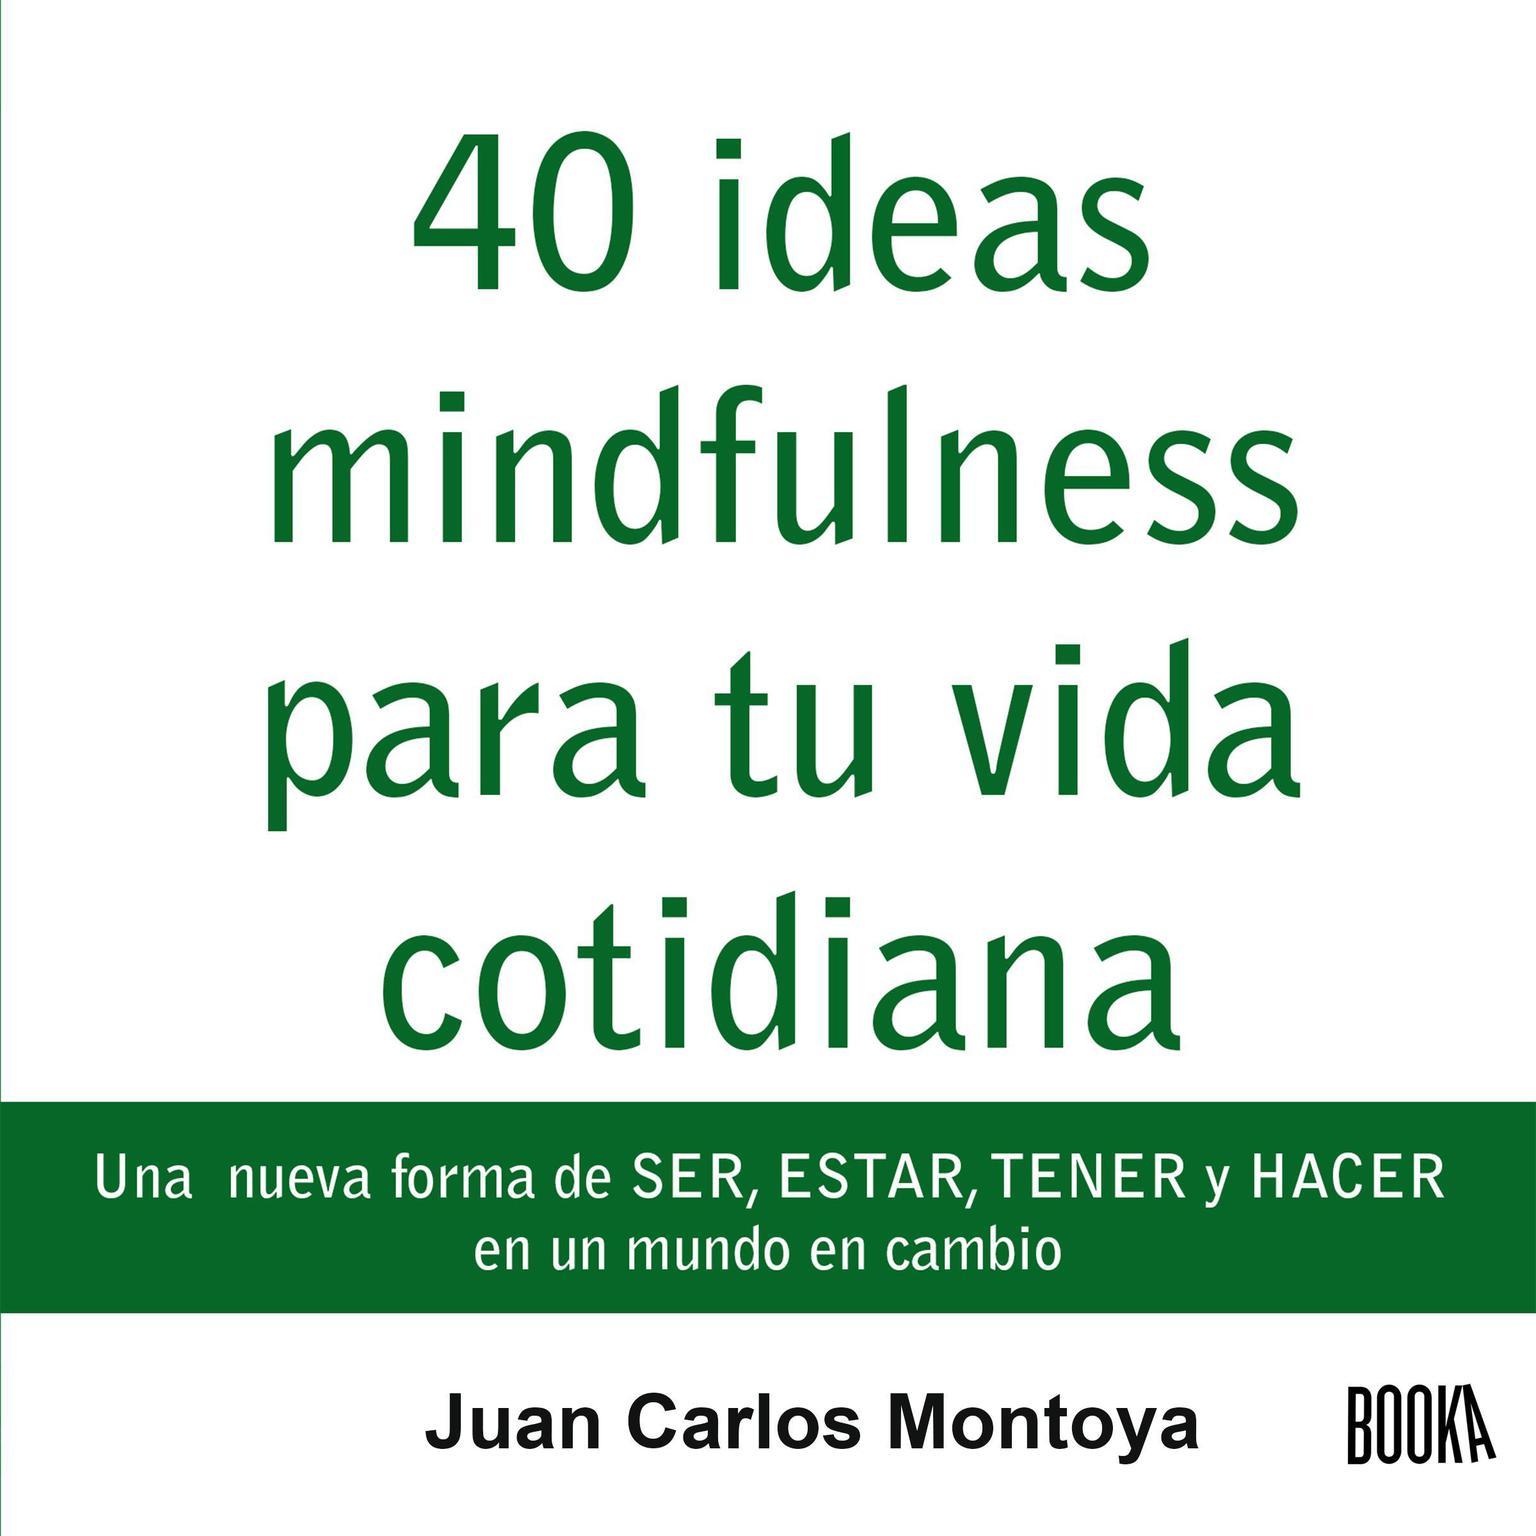 40 ideas mindfulness para tu vida cotidiana Audiobook, by Juan Carlos Montoya